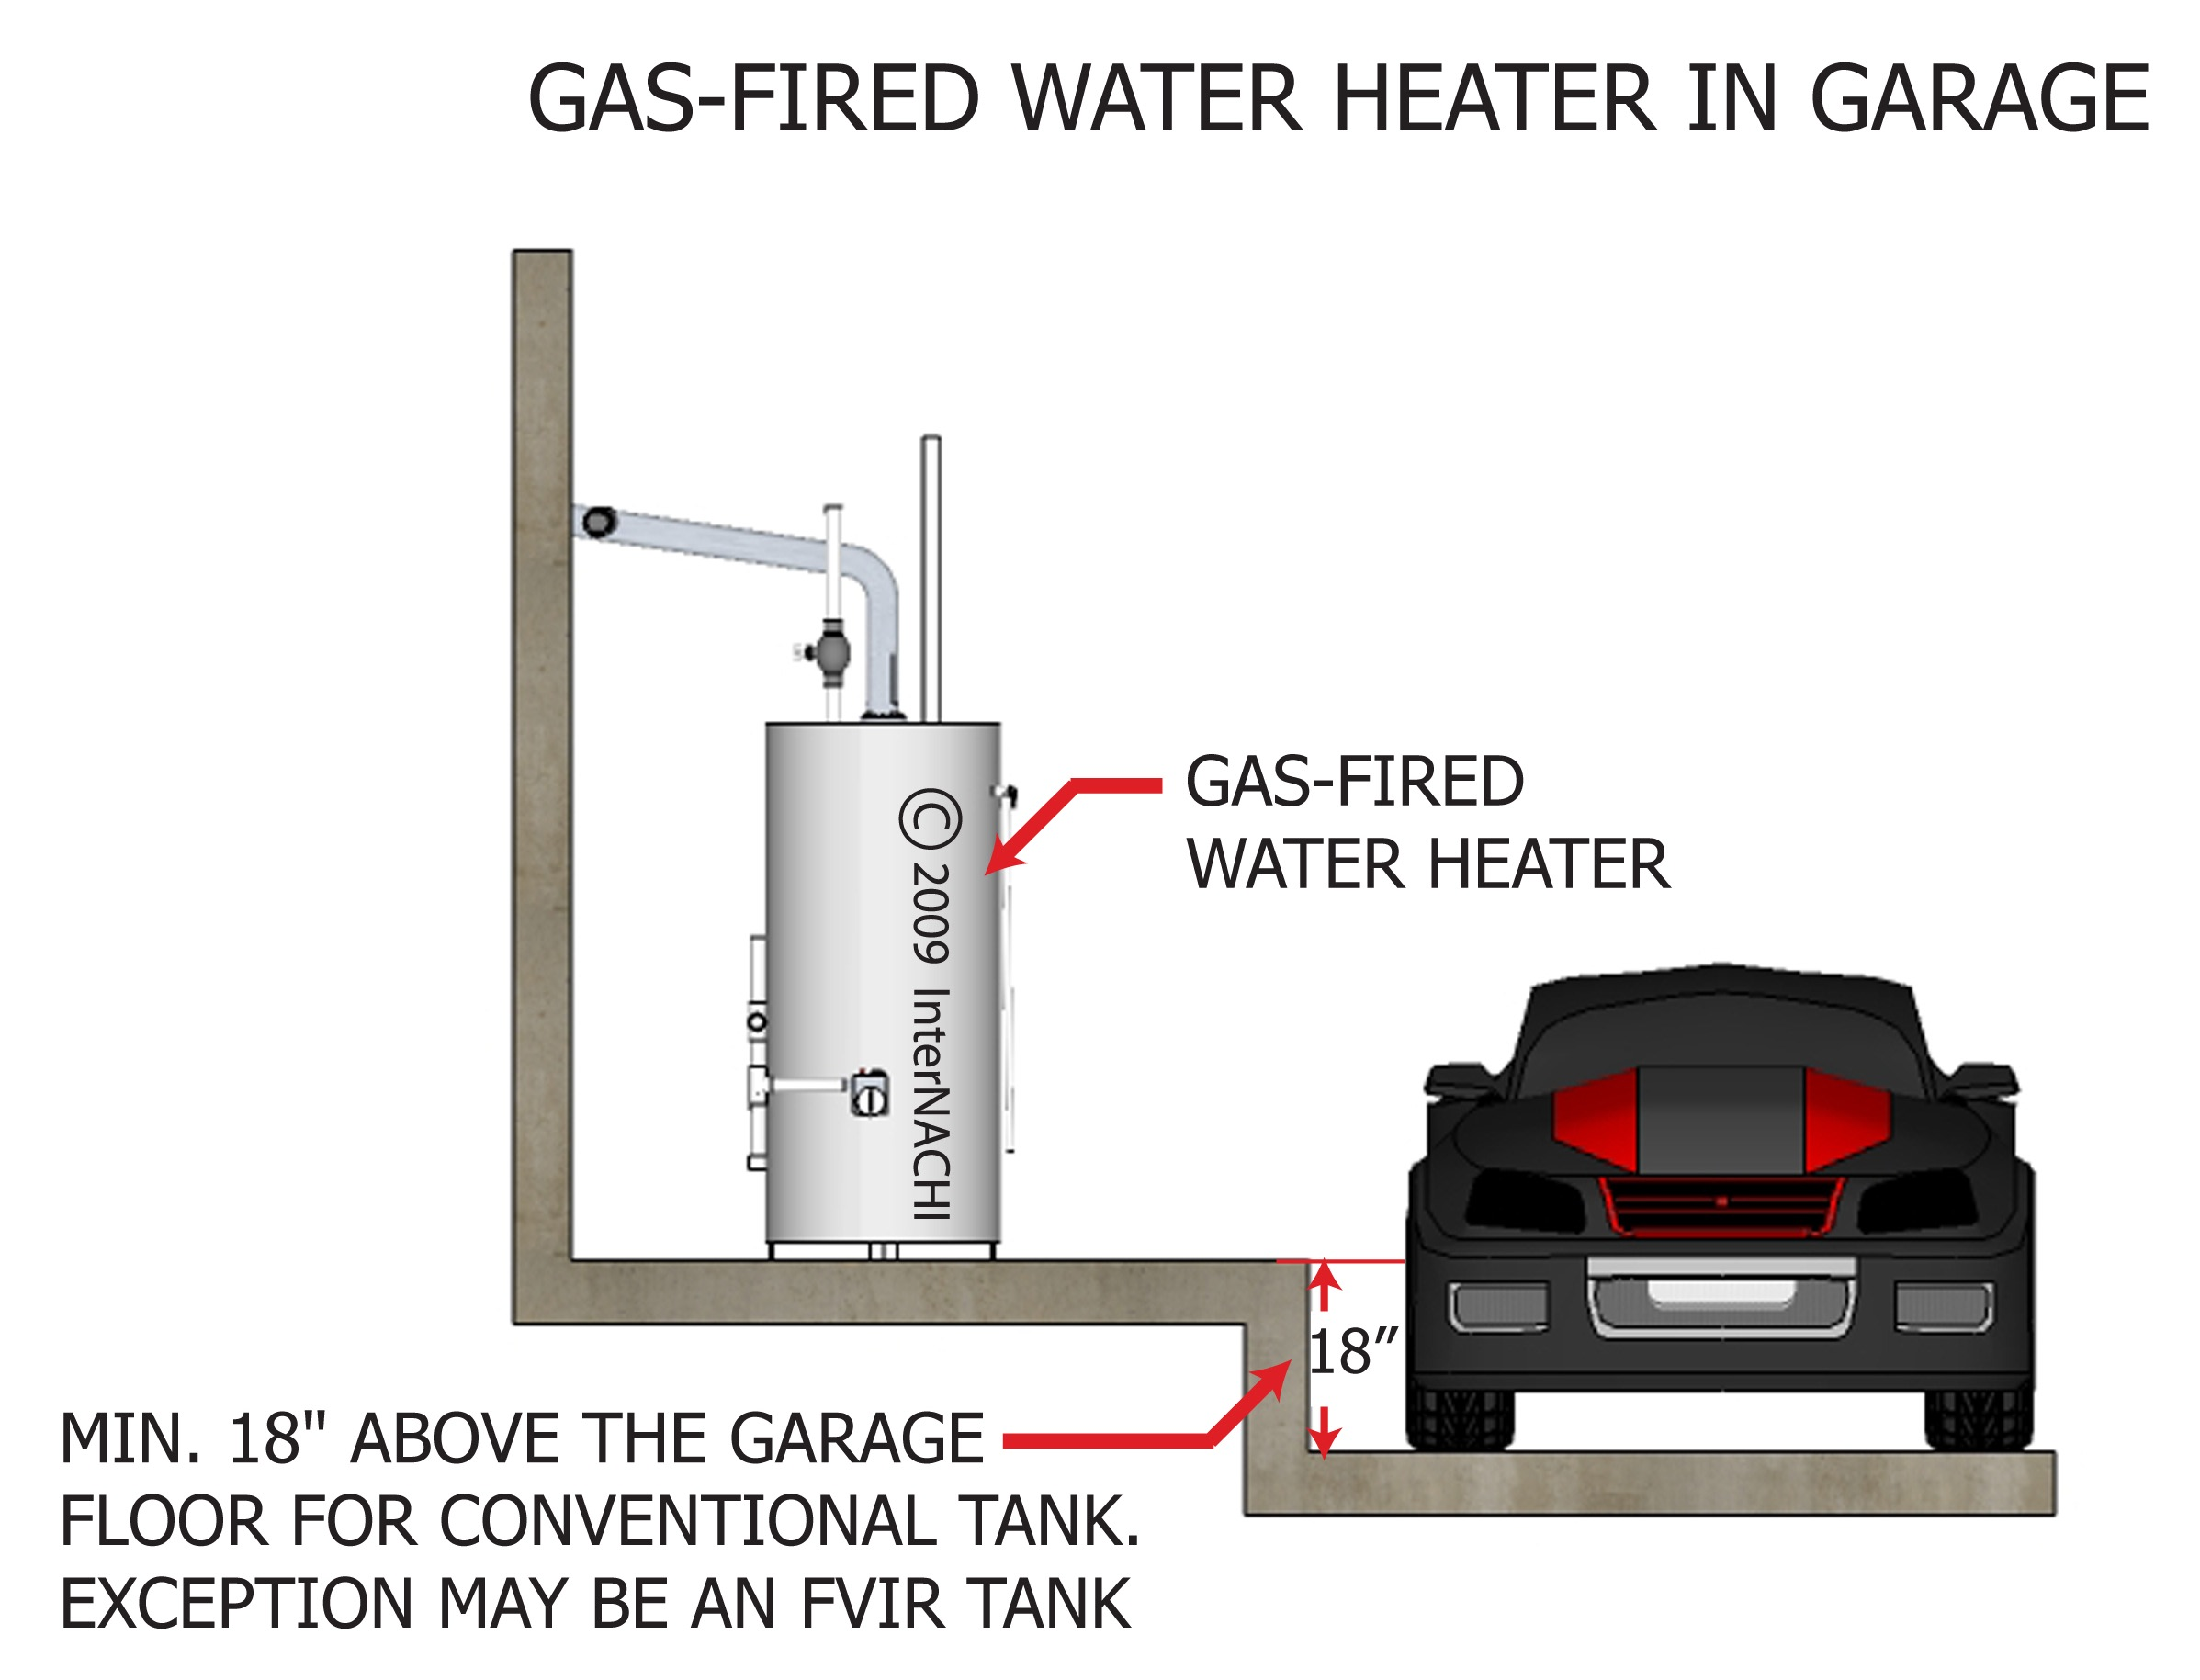 Gas-fired water heater in garage.